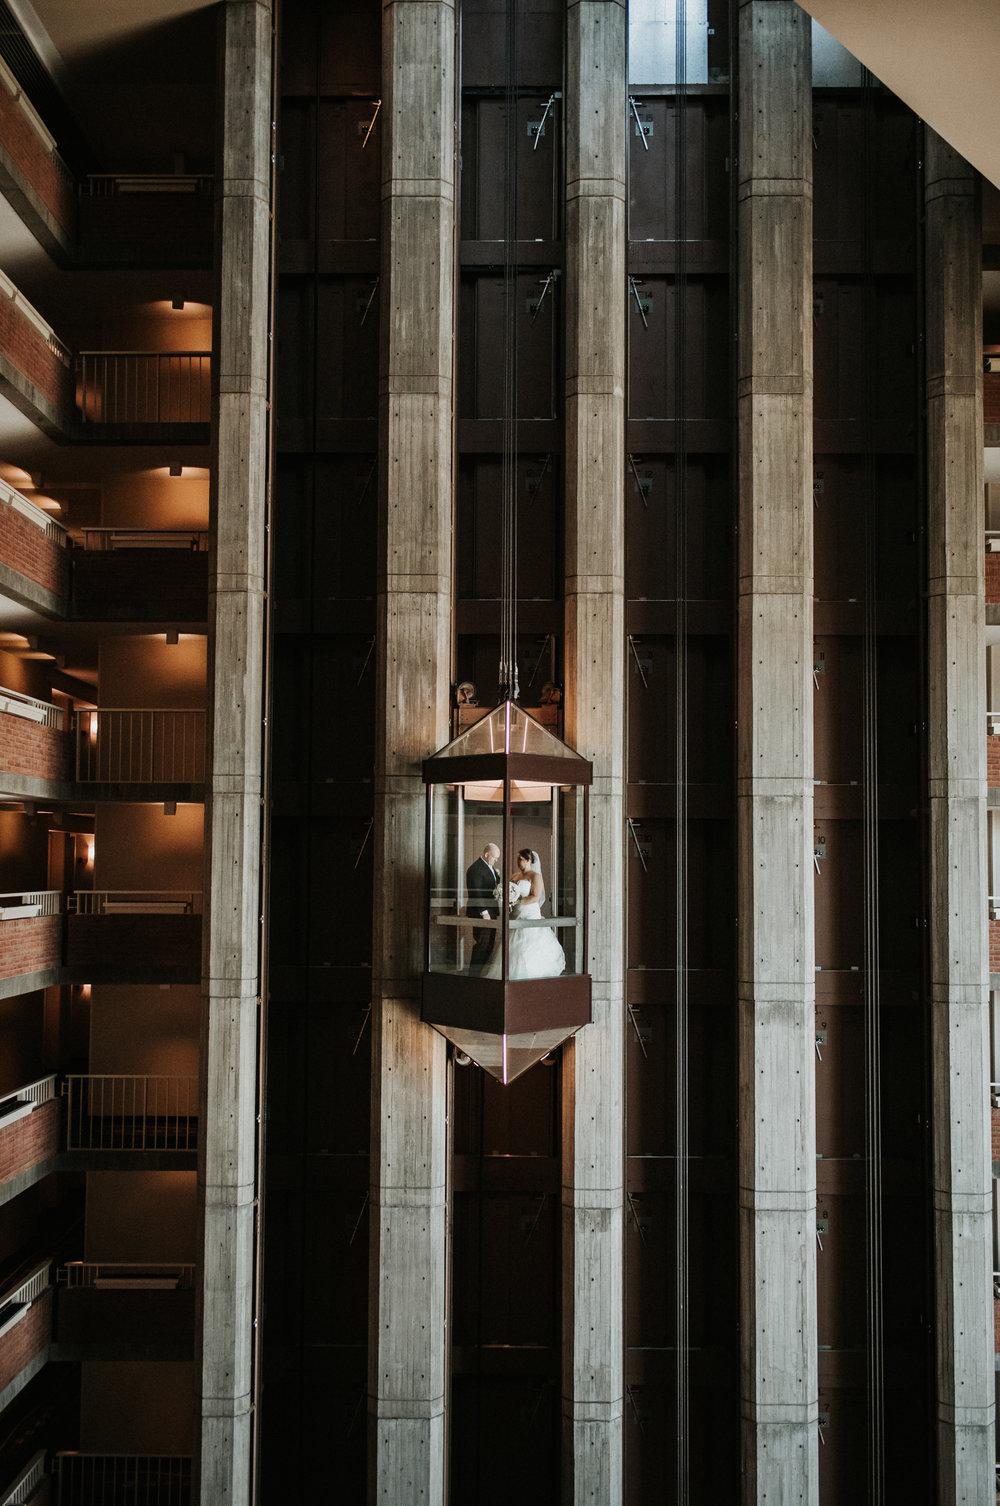 Paul-Robert-Berman-Photography-19.jpg